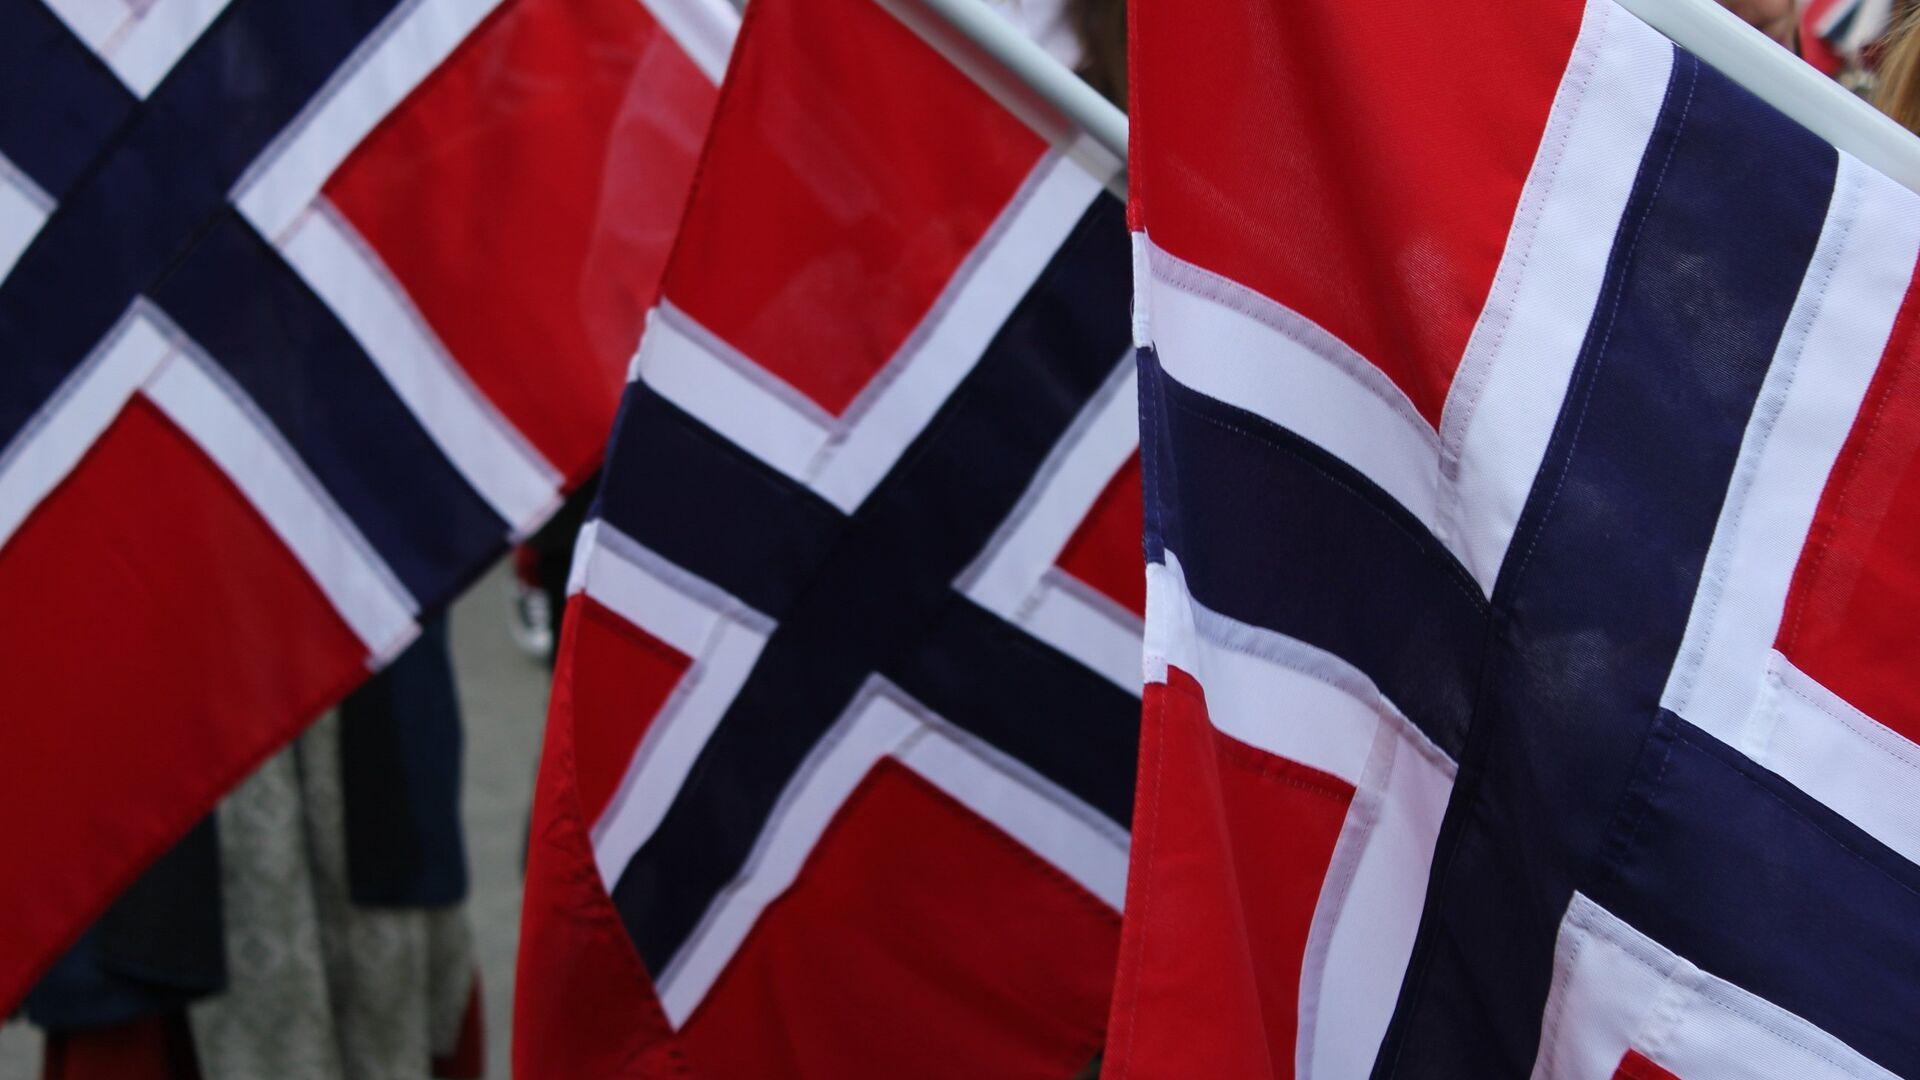 Bandera de Noruega - Sputnik Mundo, 1920, 13.08.2021